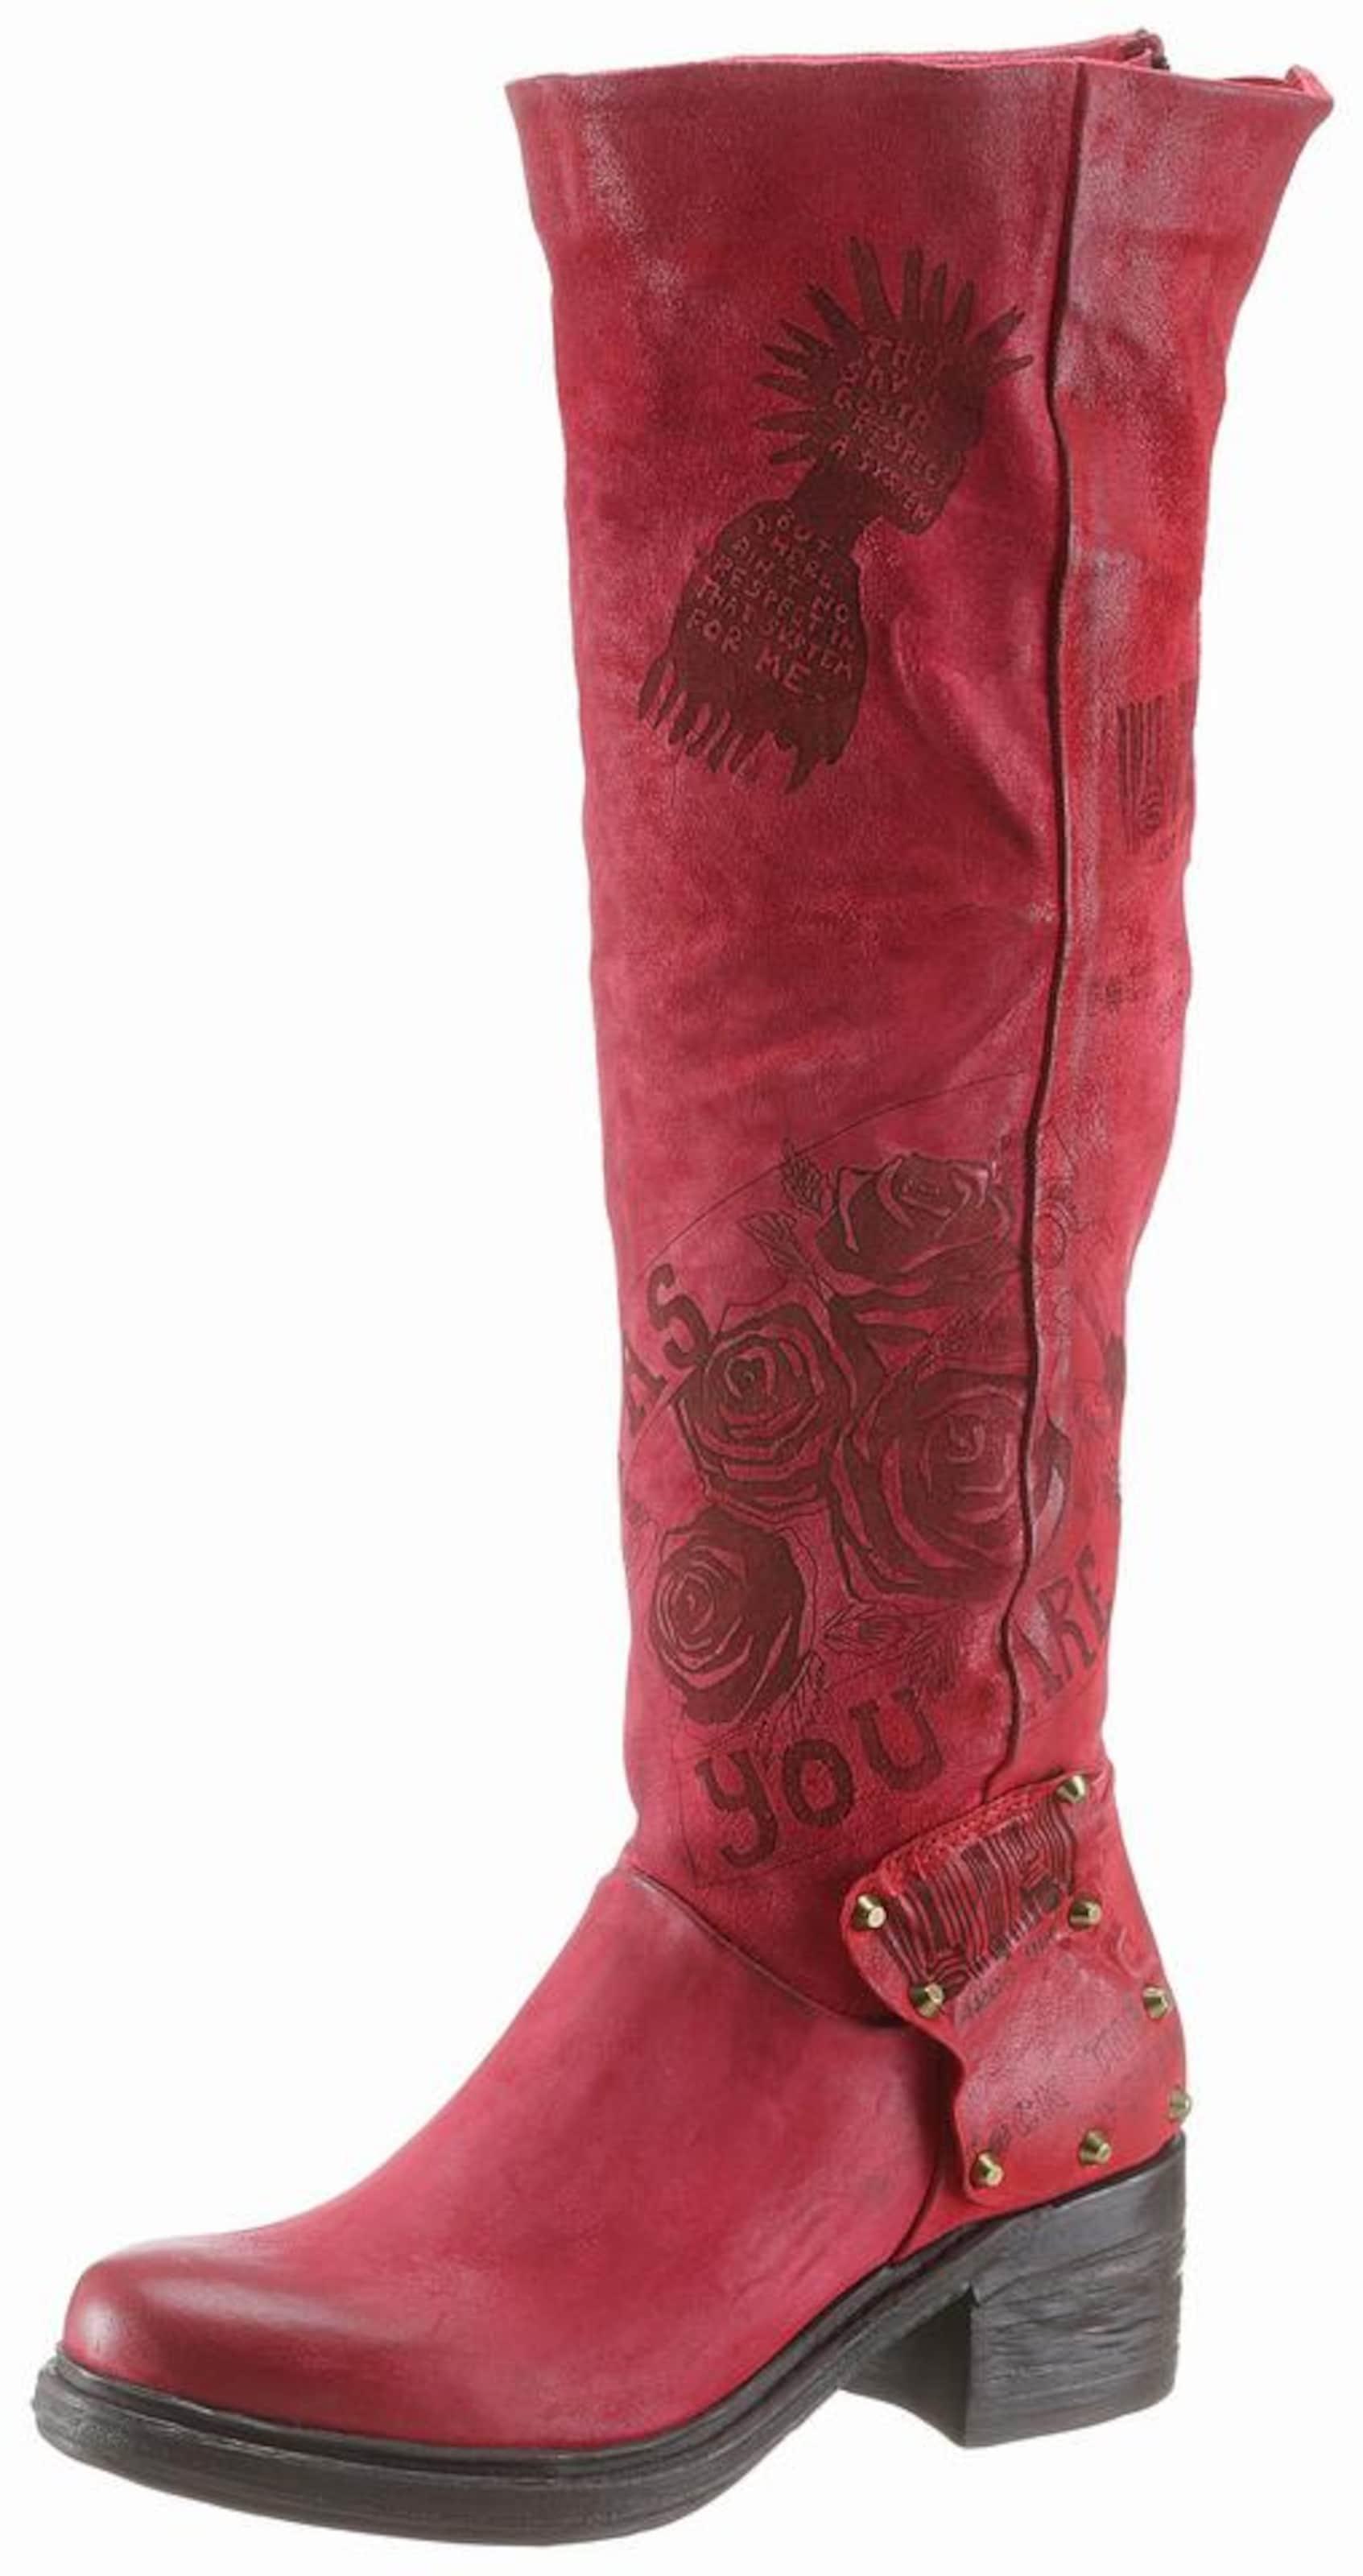 Rabatt Preis A.S.98 Stiefel Freiheit 100% Garantiert Factory-Outlet-Verkauf 5NQMby